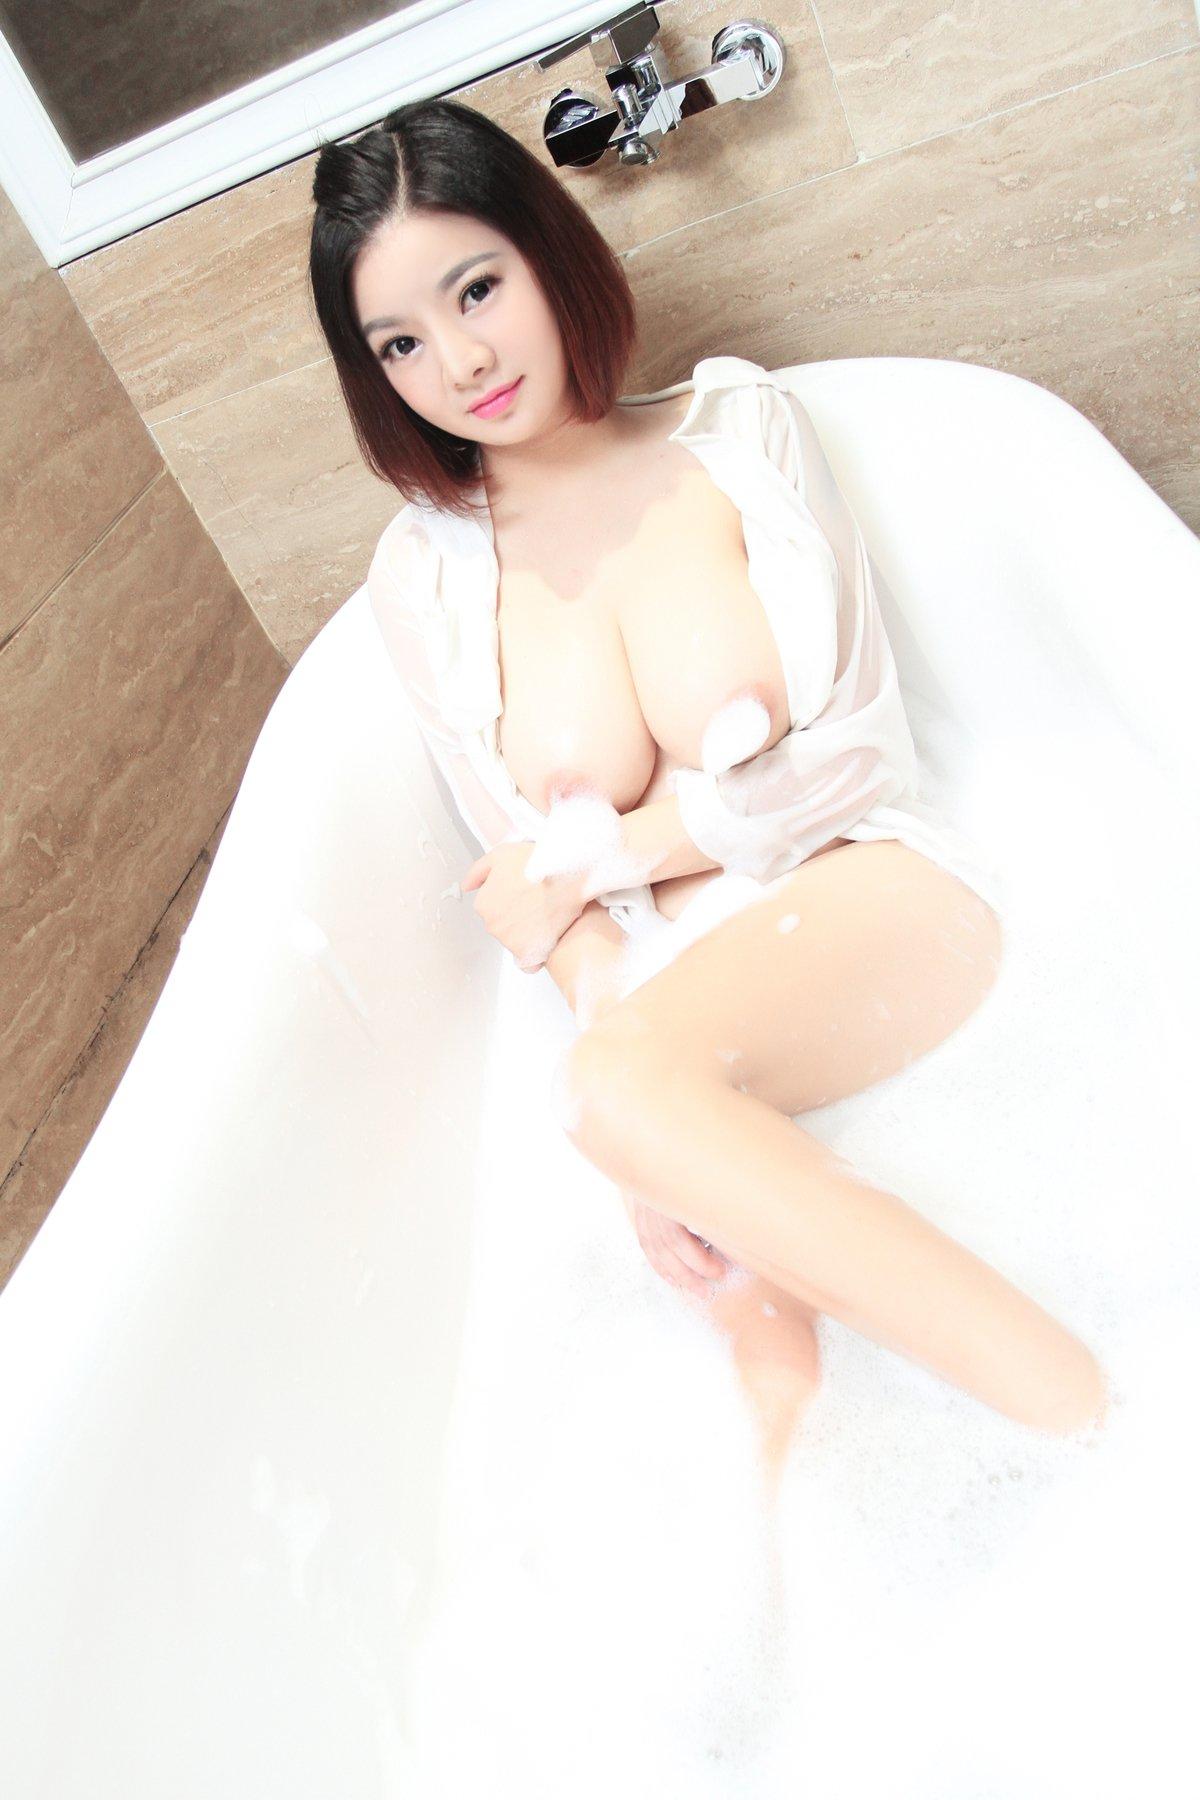 professional erotic massage cherry girls escorts